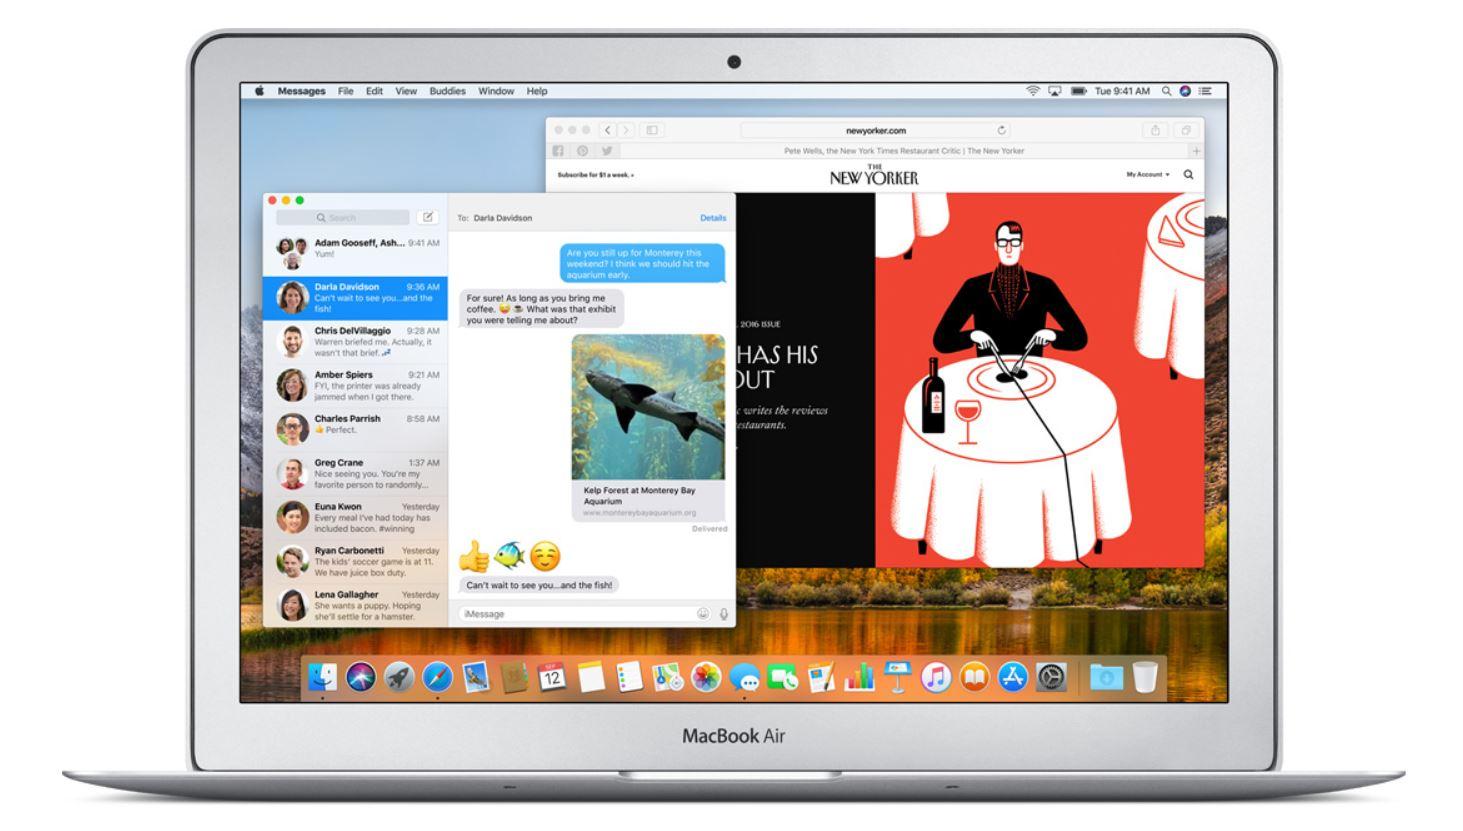 ¿Adiós al MacBook Air?